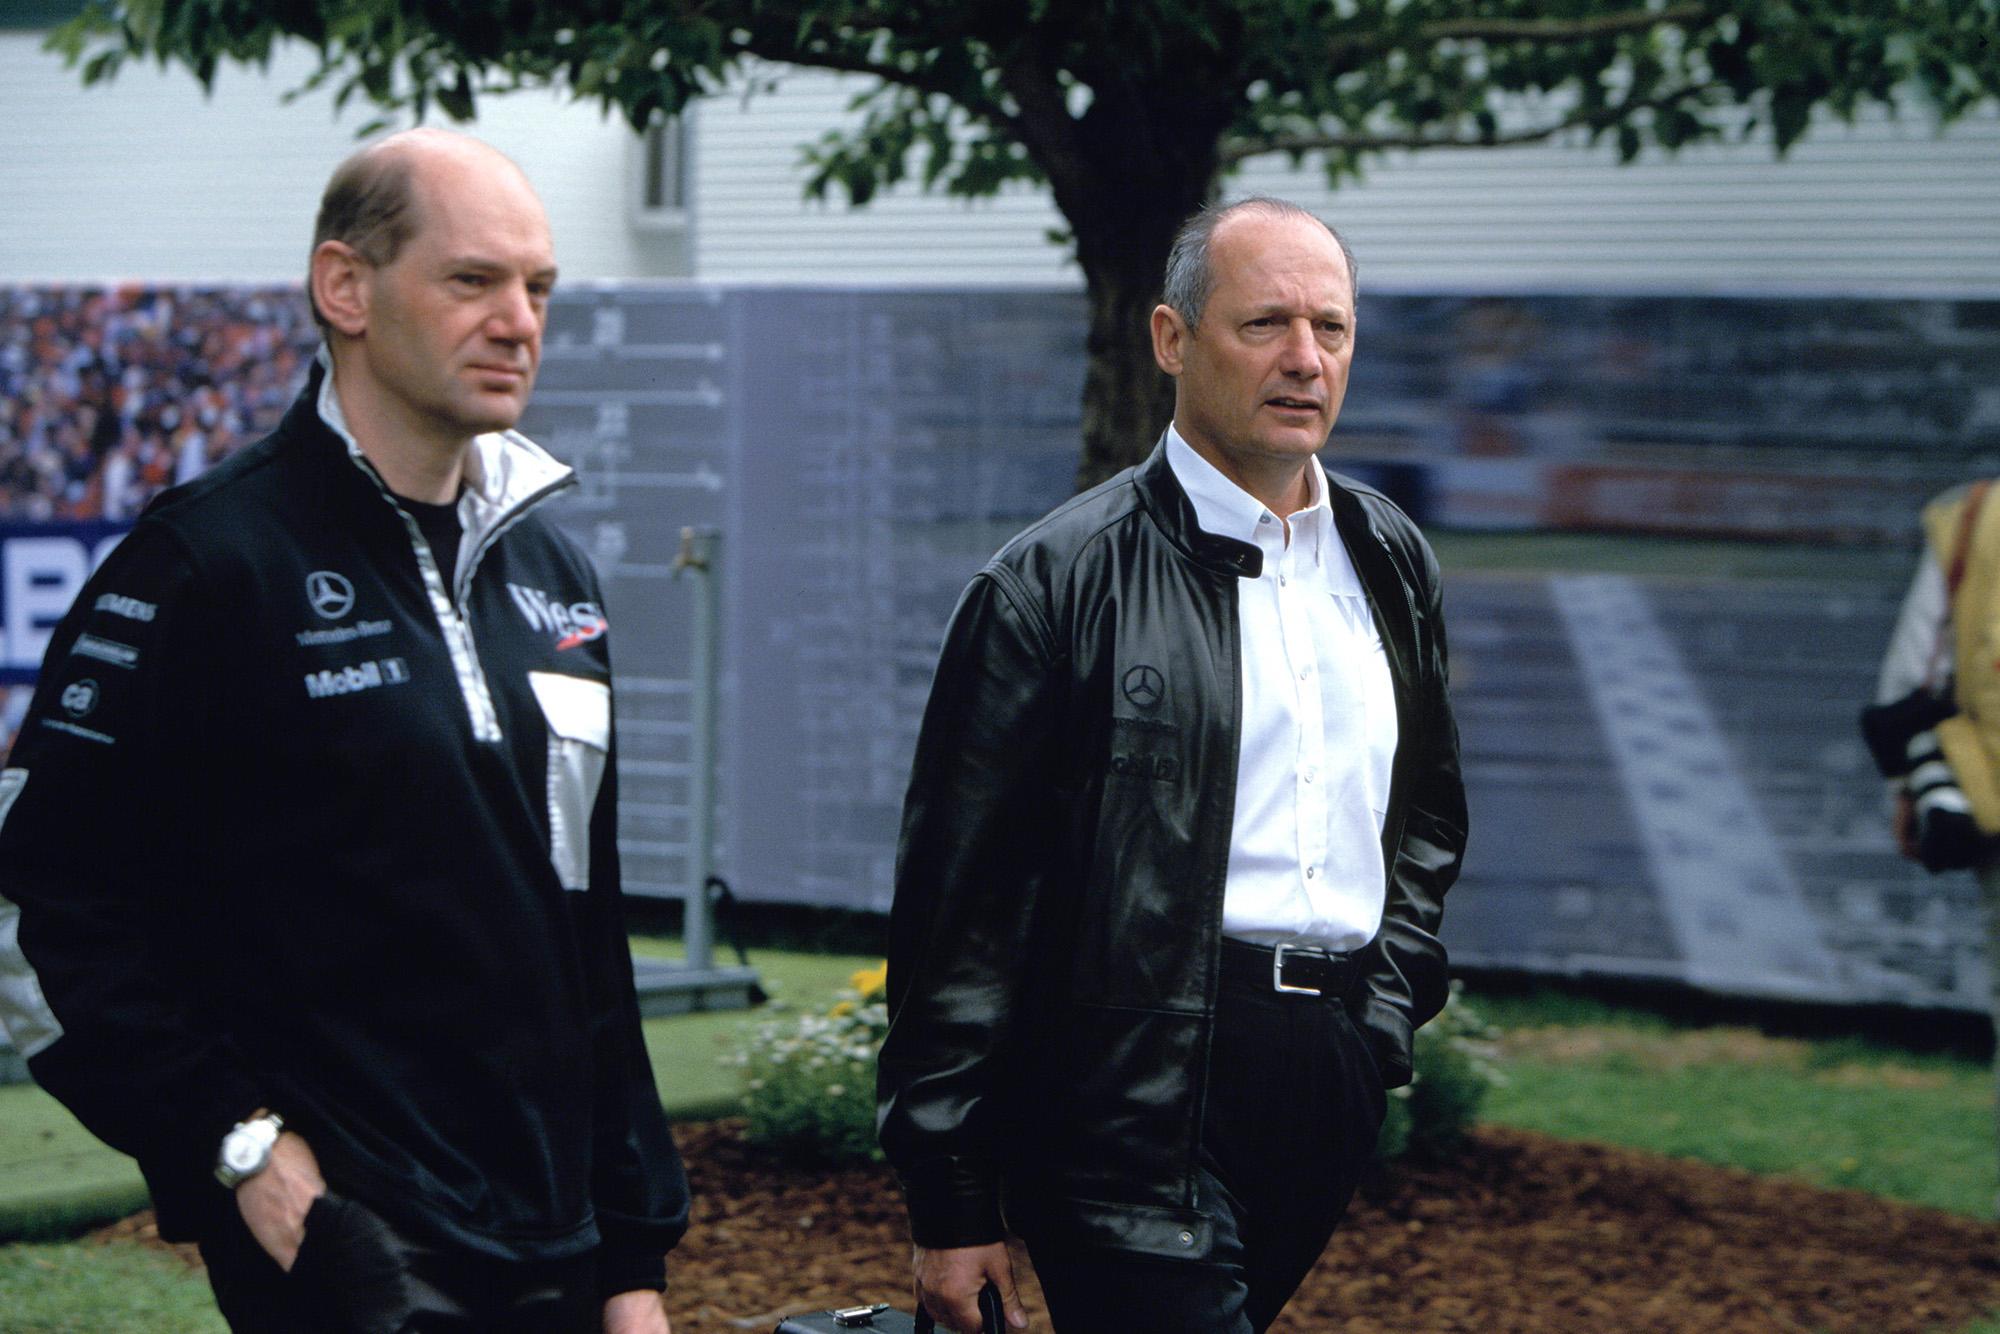 Adrian Newey with Ron Dennis in 2004